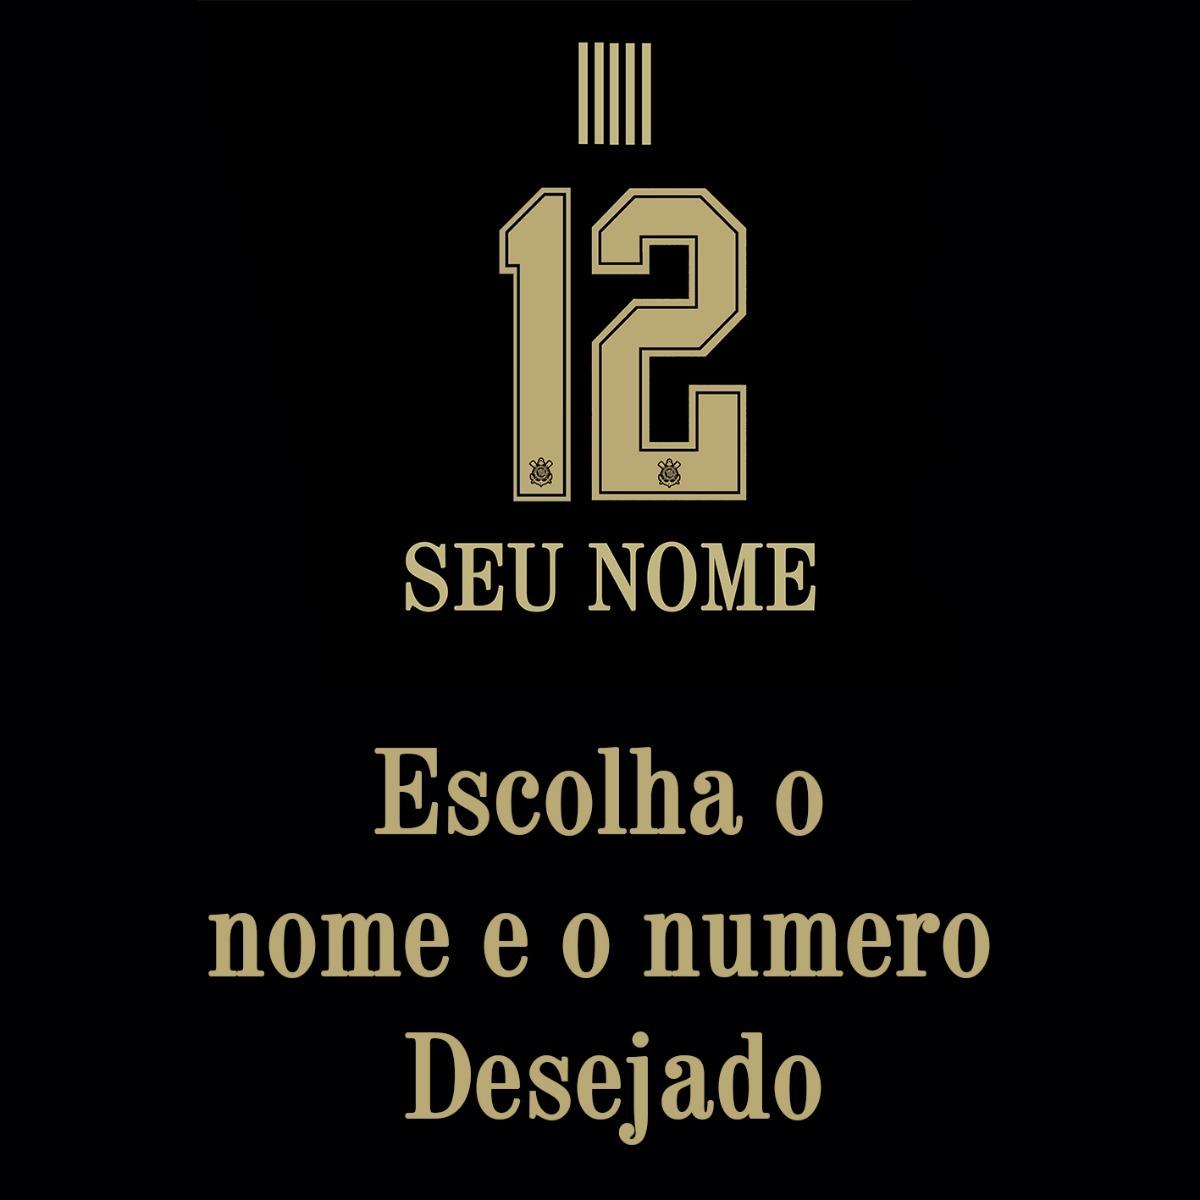 Caneca Corinthians Ayrton Senna 2018 Com Seu Nome + Brinde - R  34 ... 2caa4fc2e31ea